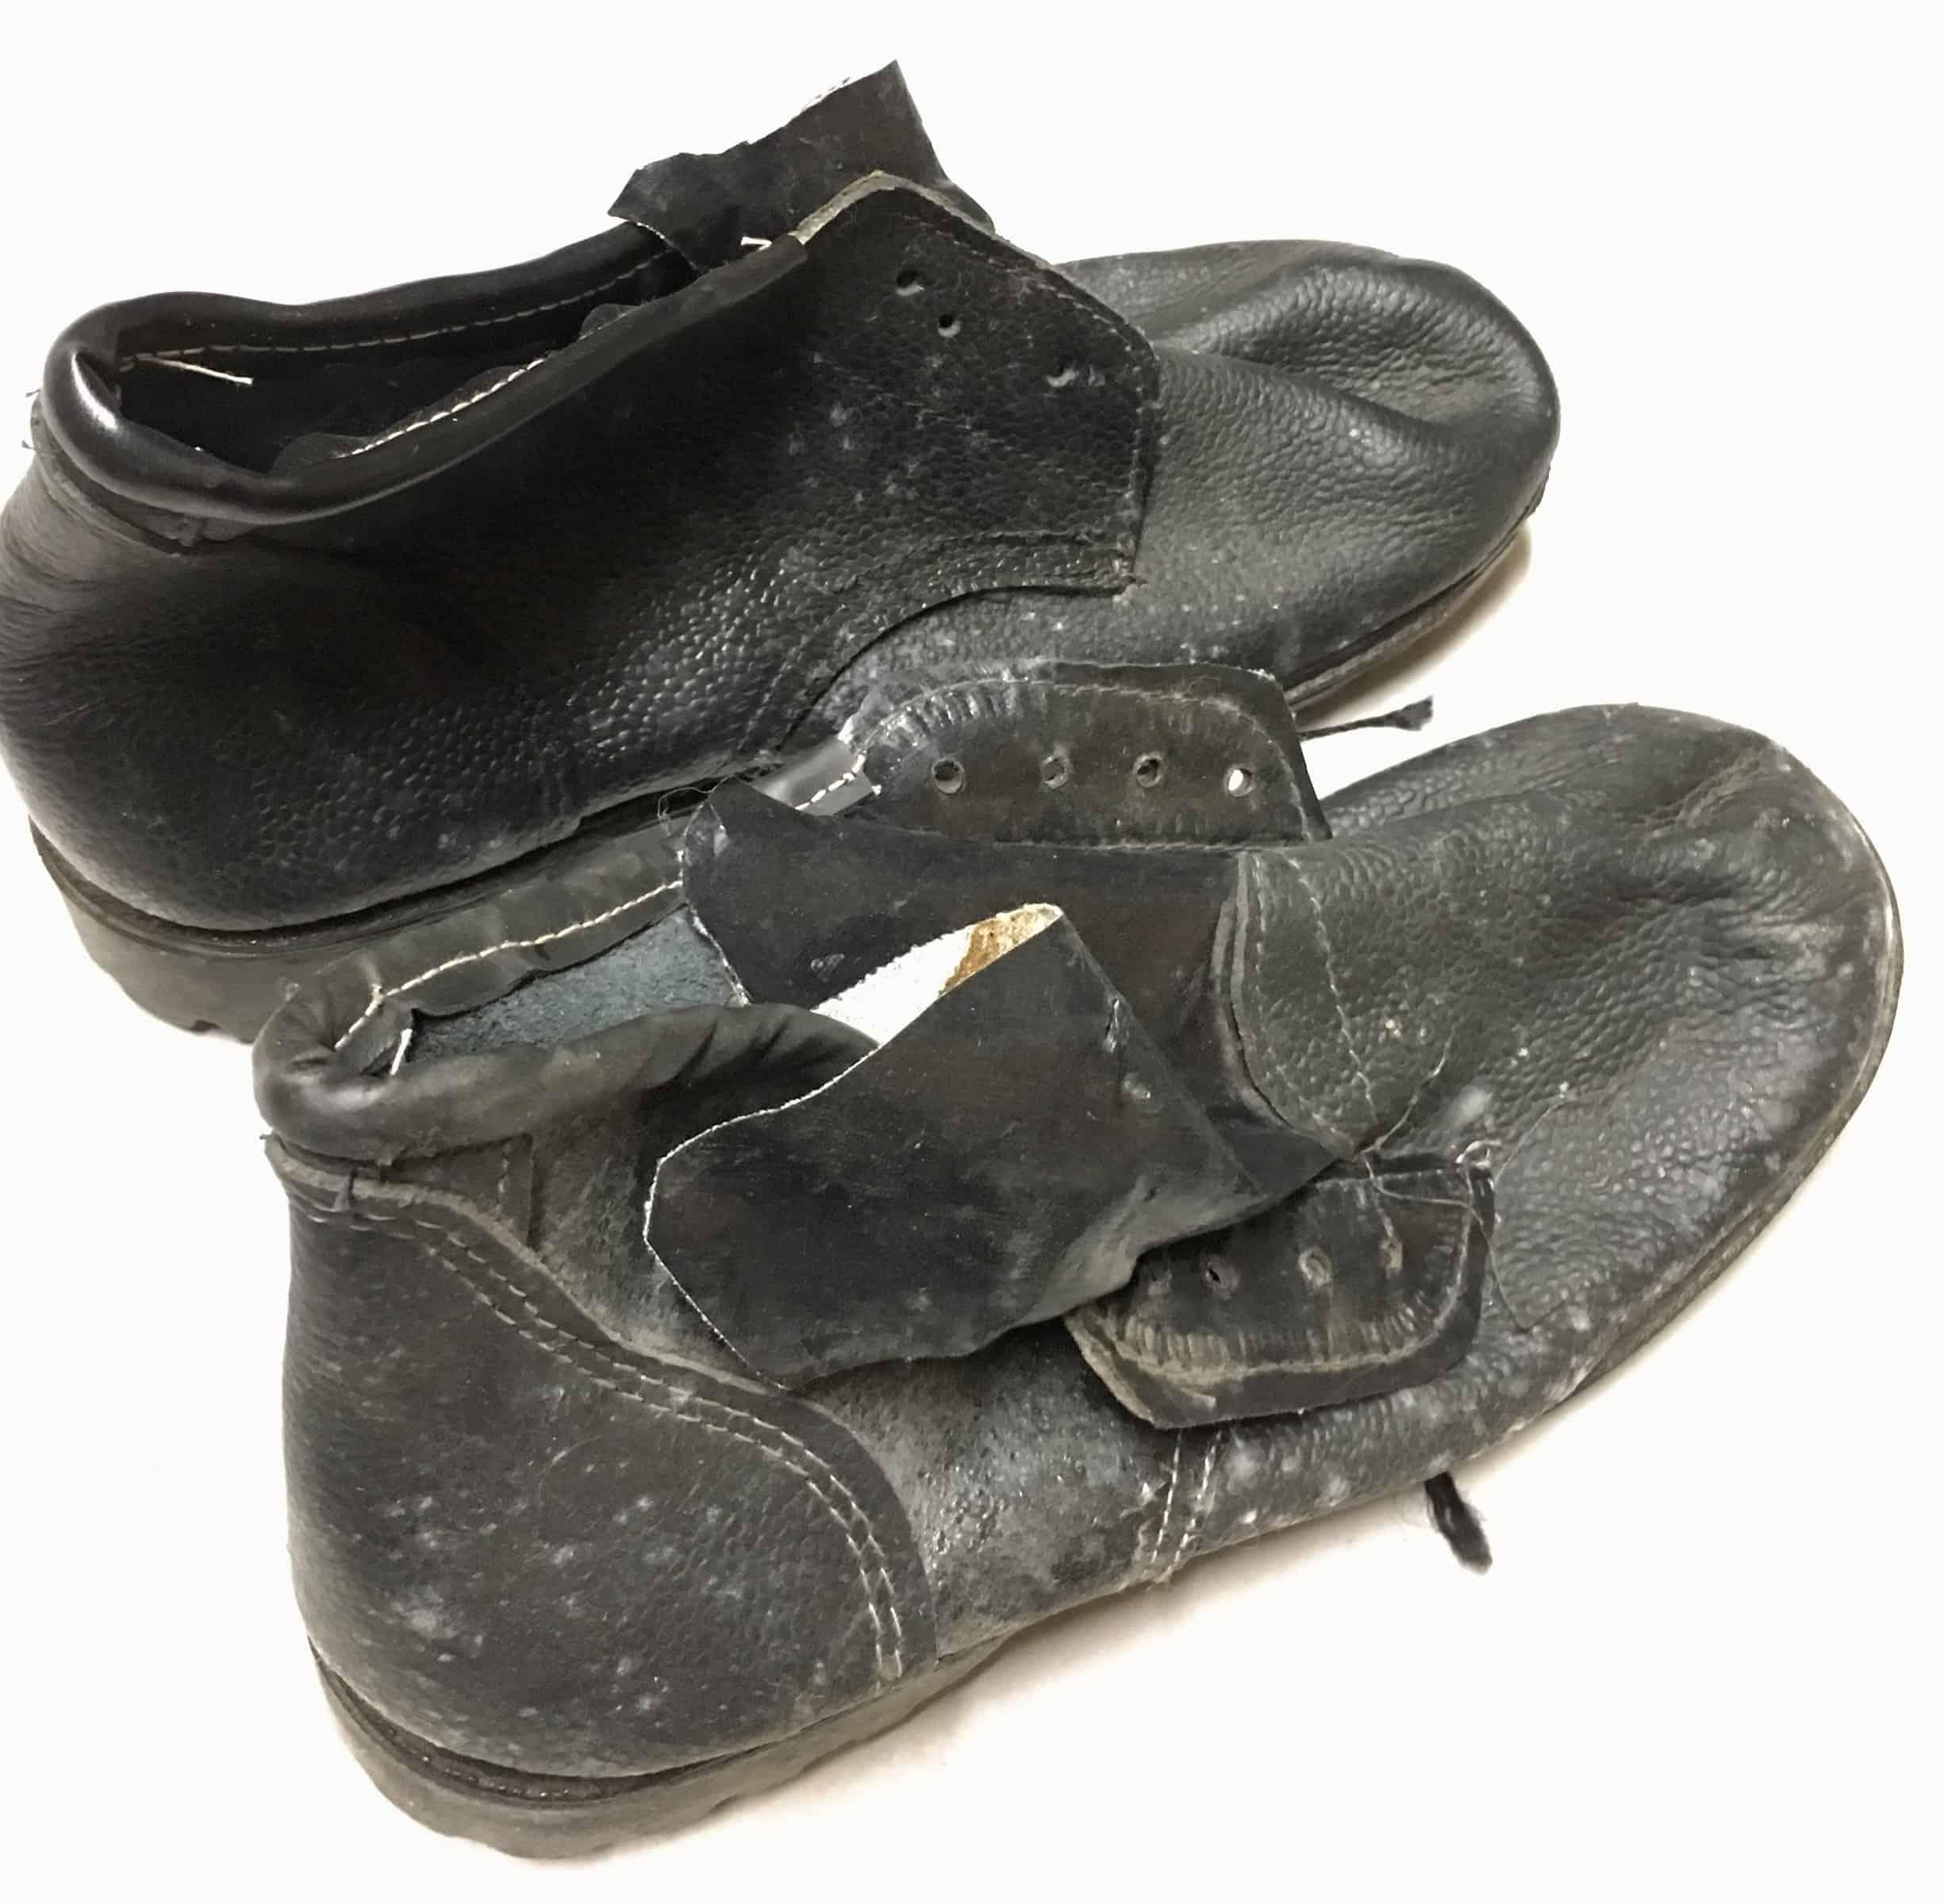 Black Shoes Storm Leather Size Low Iraqi 41 Enemy Boots Desert nO7aq7C